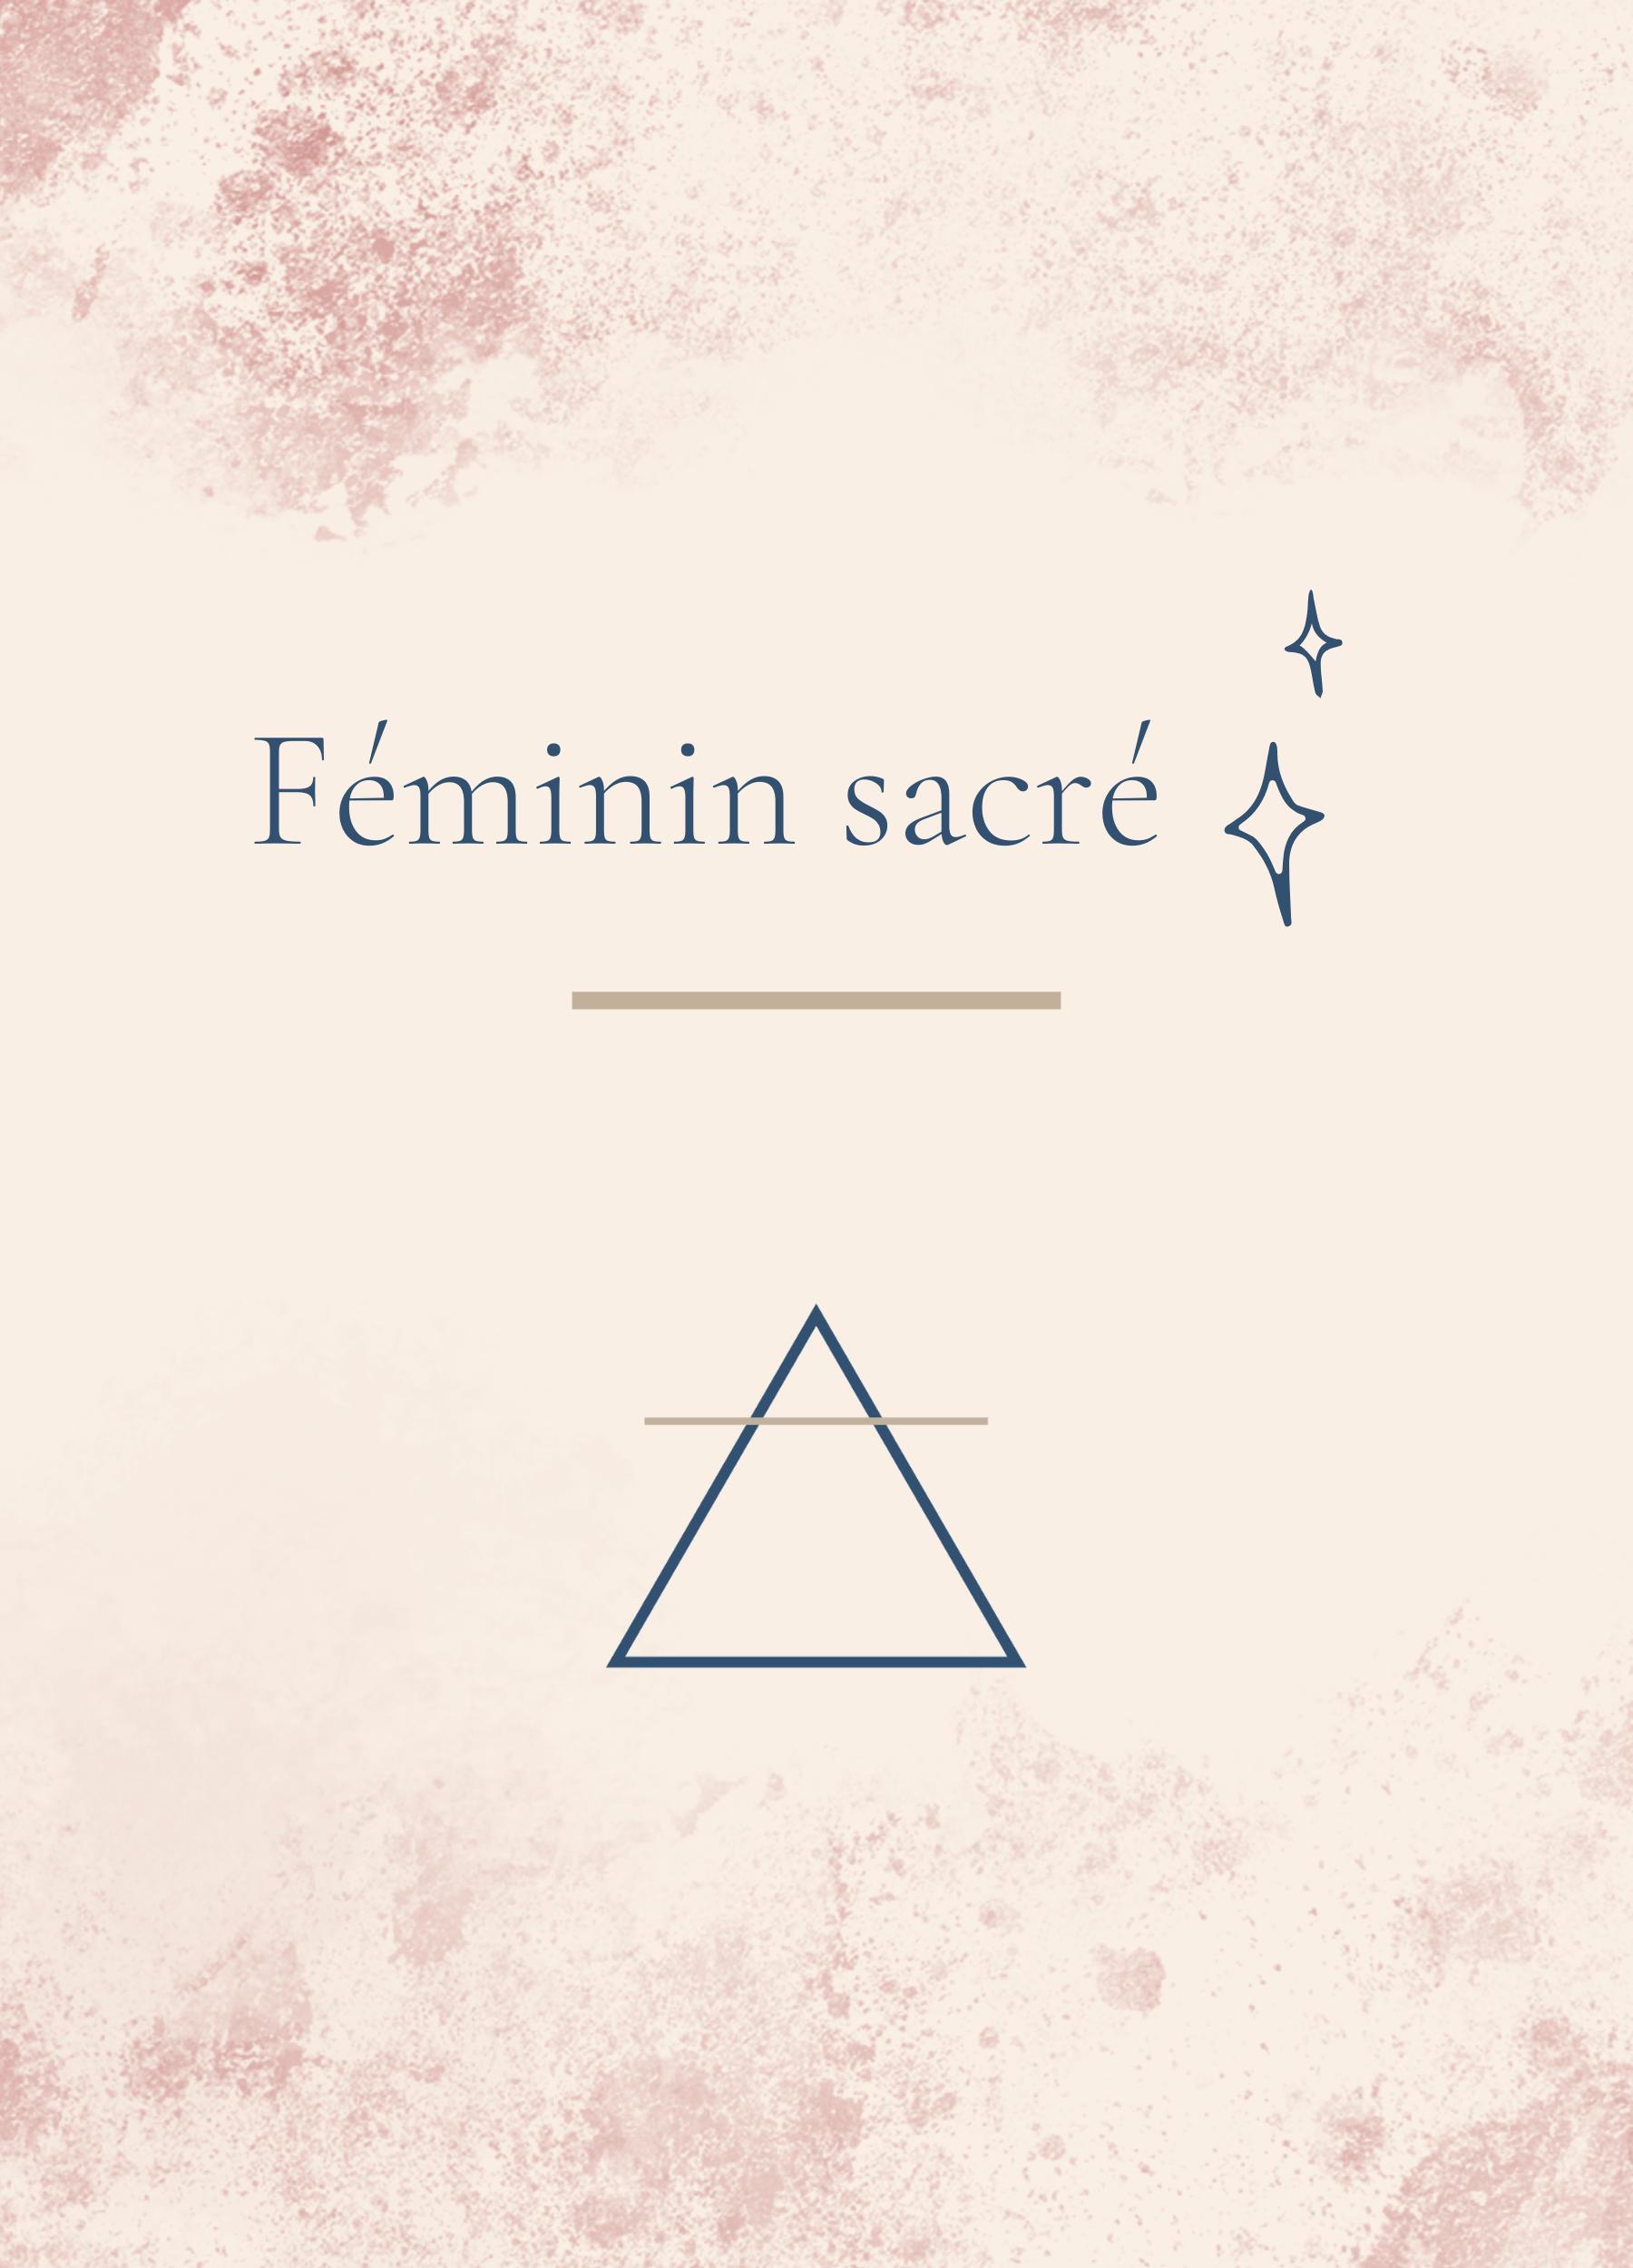 service feminin sacre